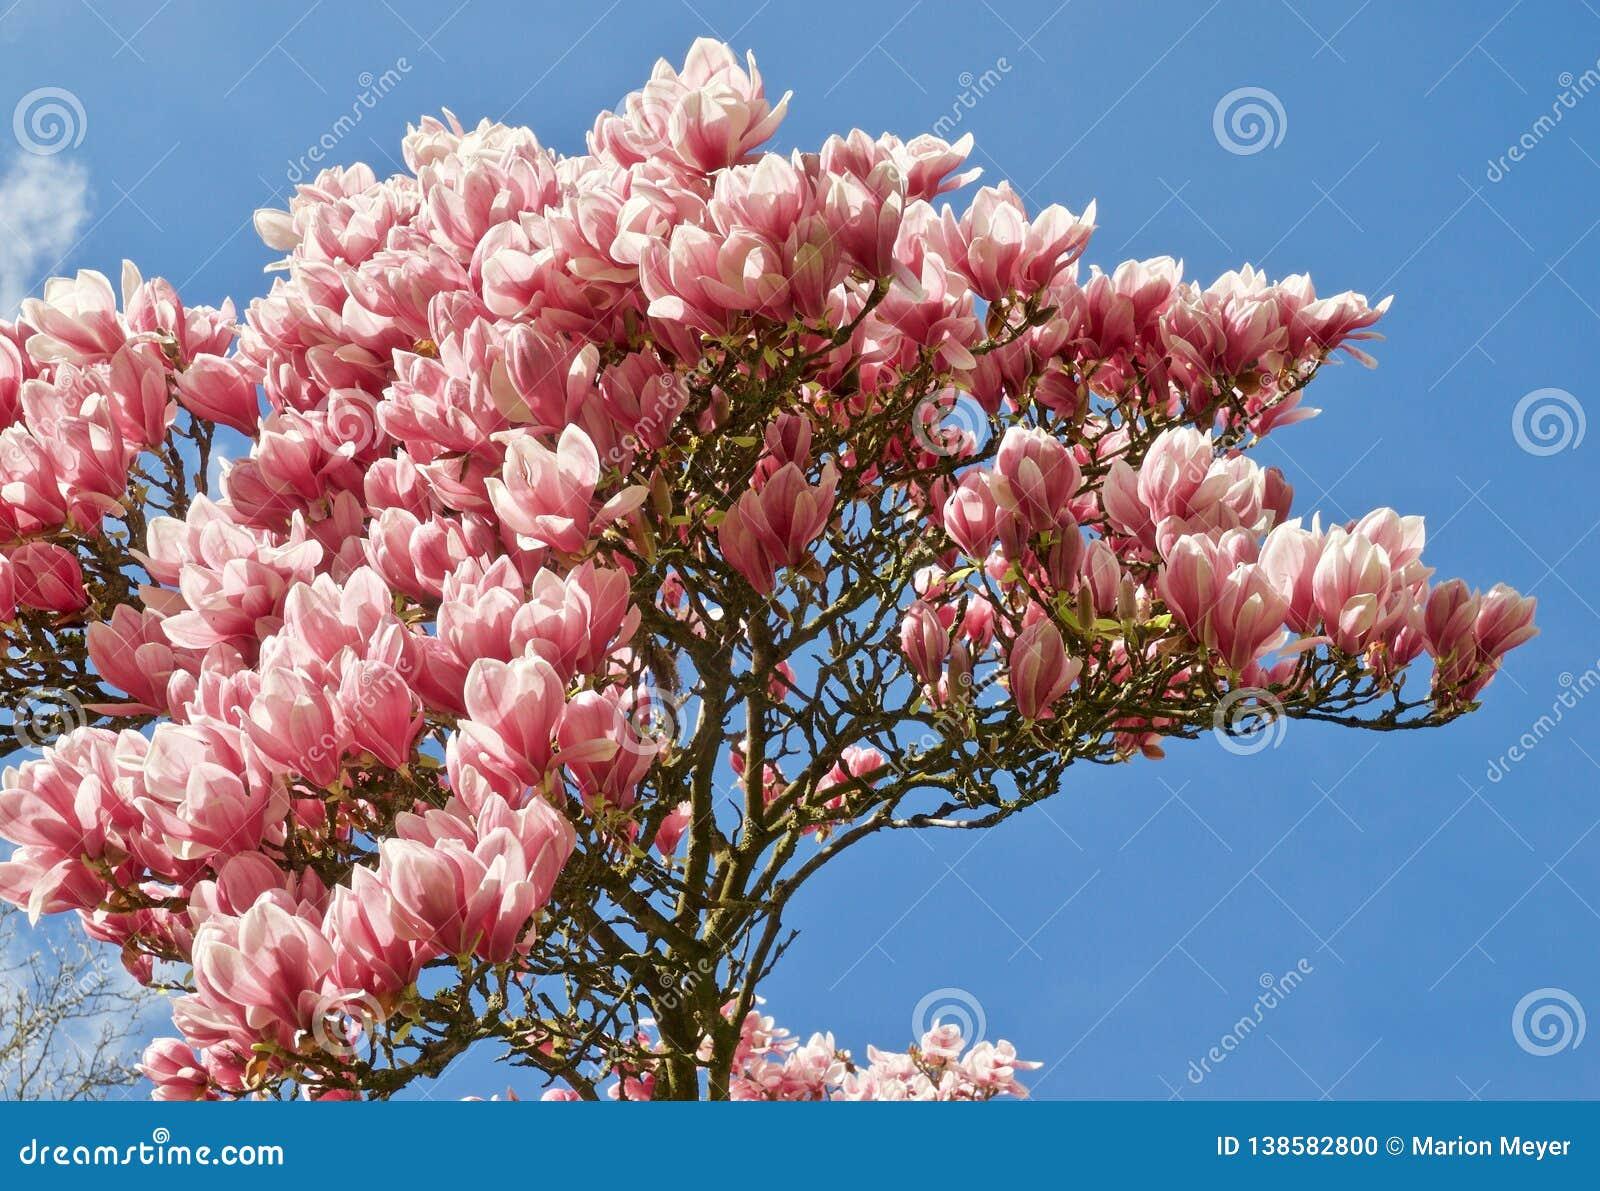 Huge Pink Blooming Magnolia Tree Stock Photo Image Of Medical